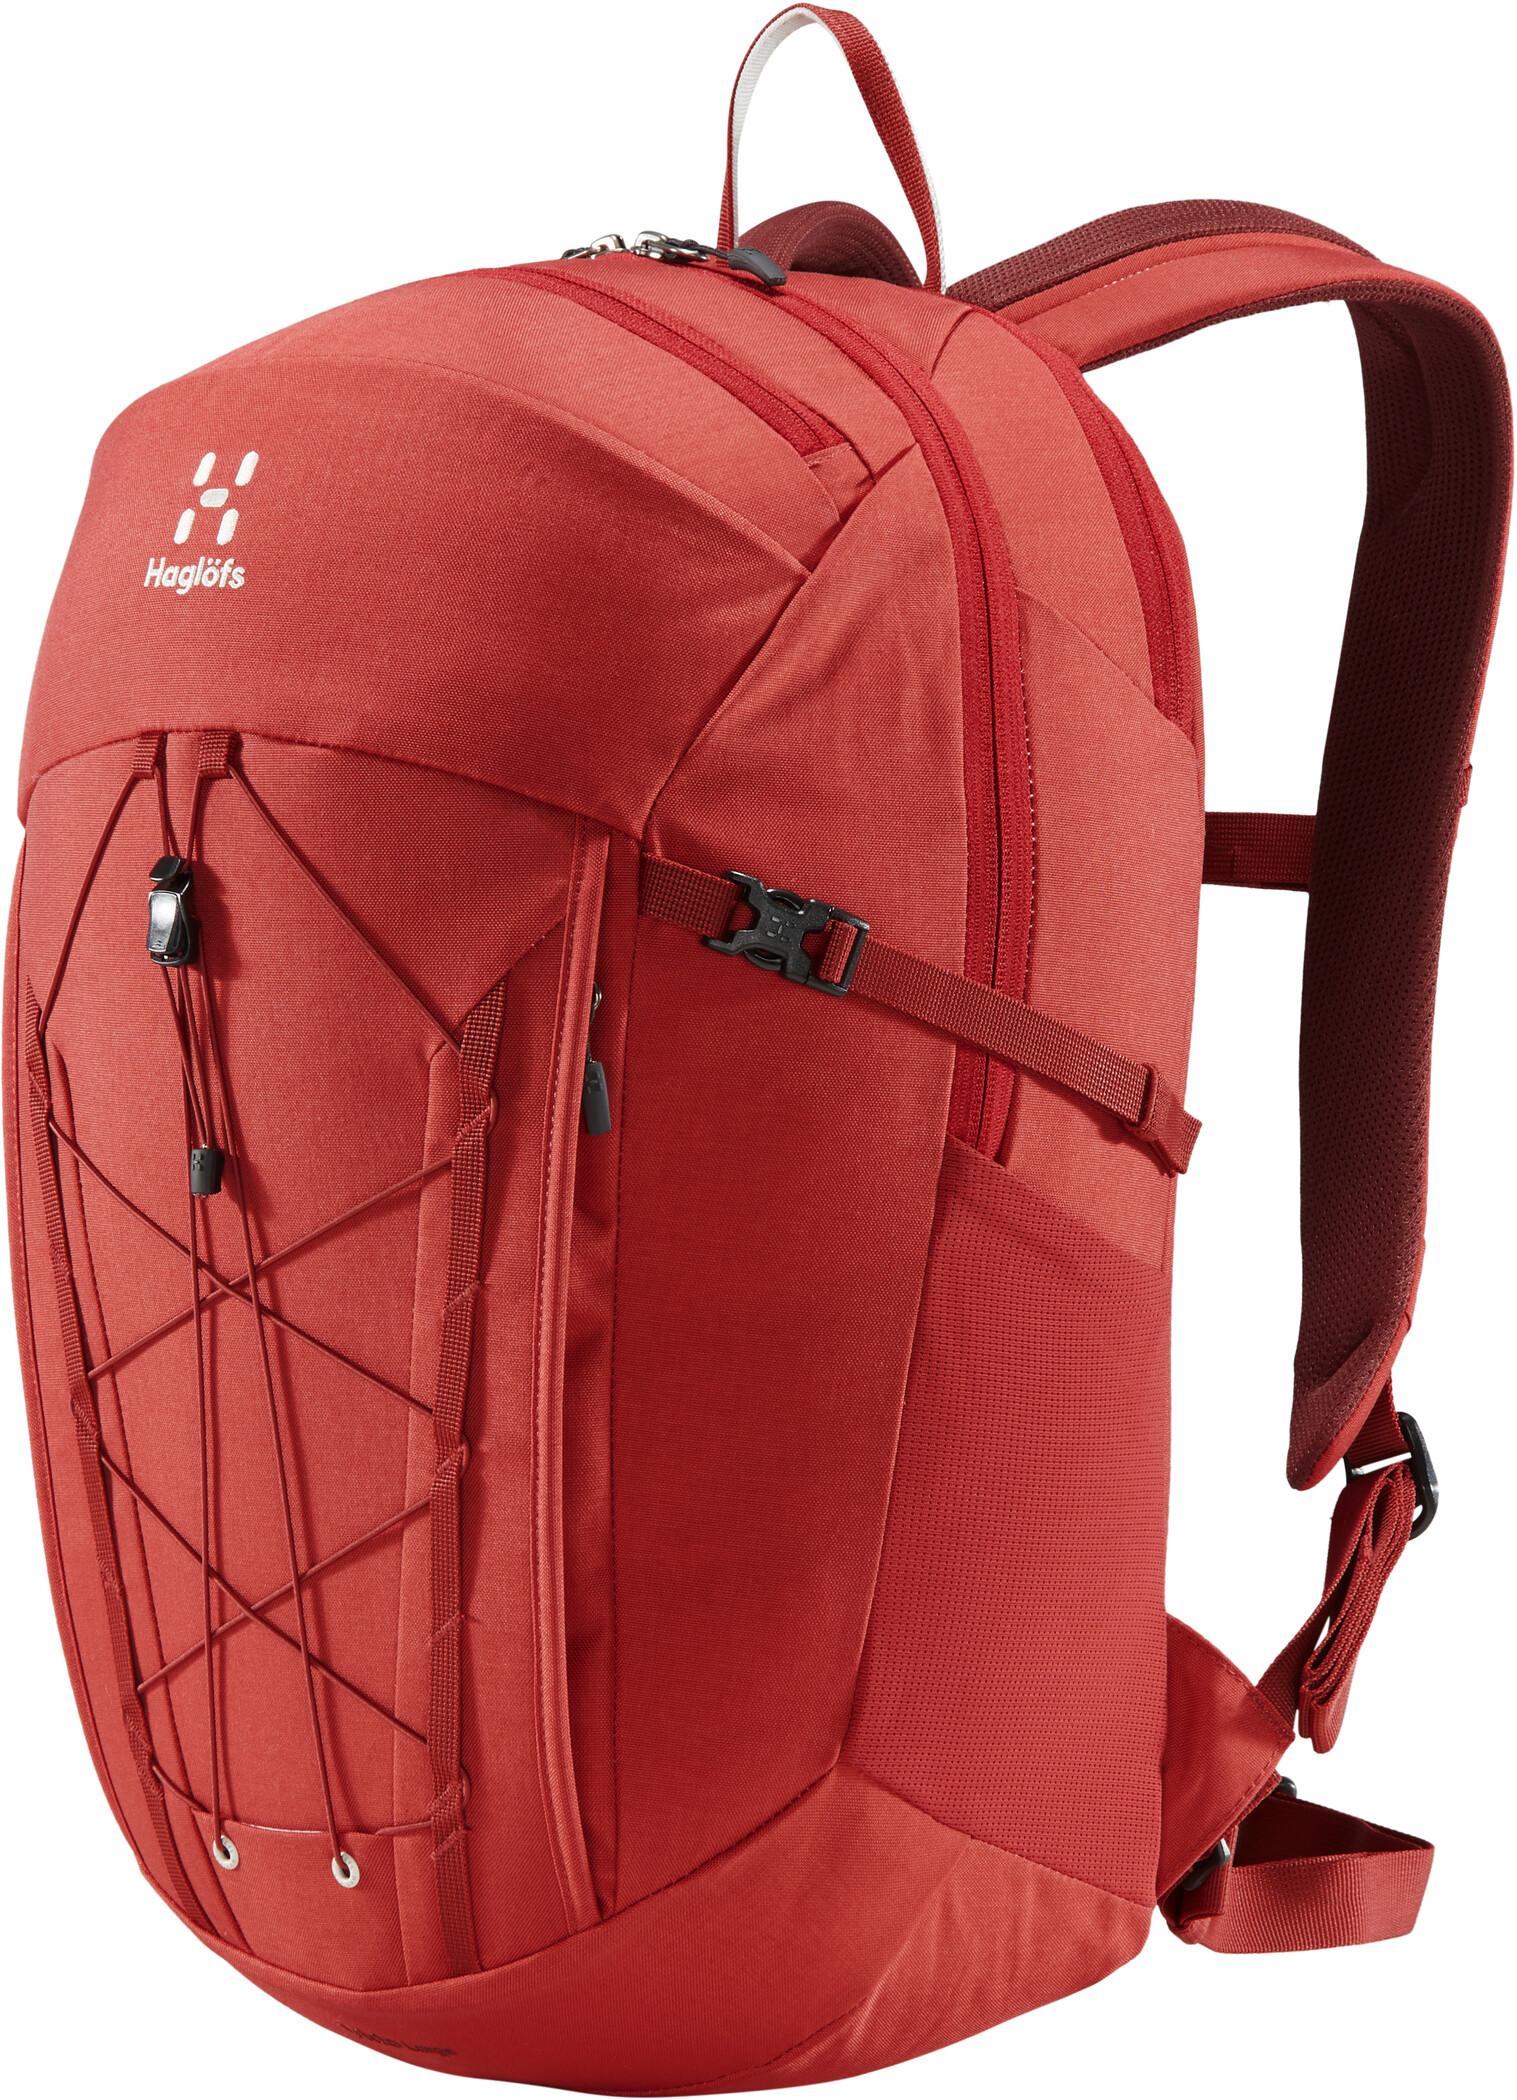 88bags & backpacks station: JACK WOLFSKIN MOAB JAM 22